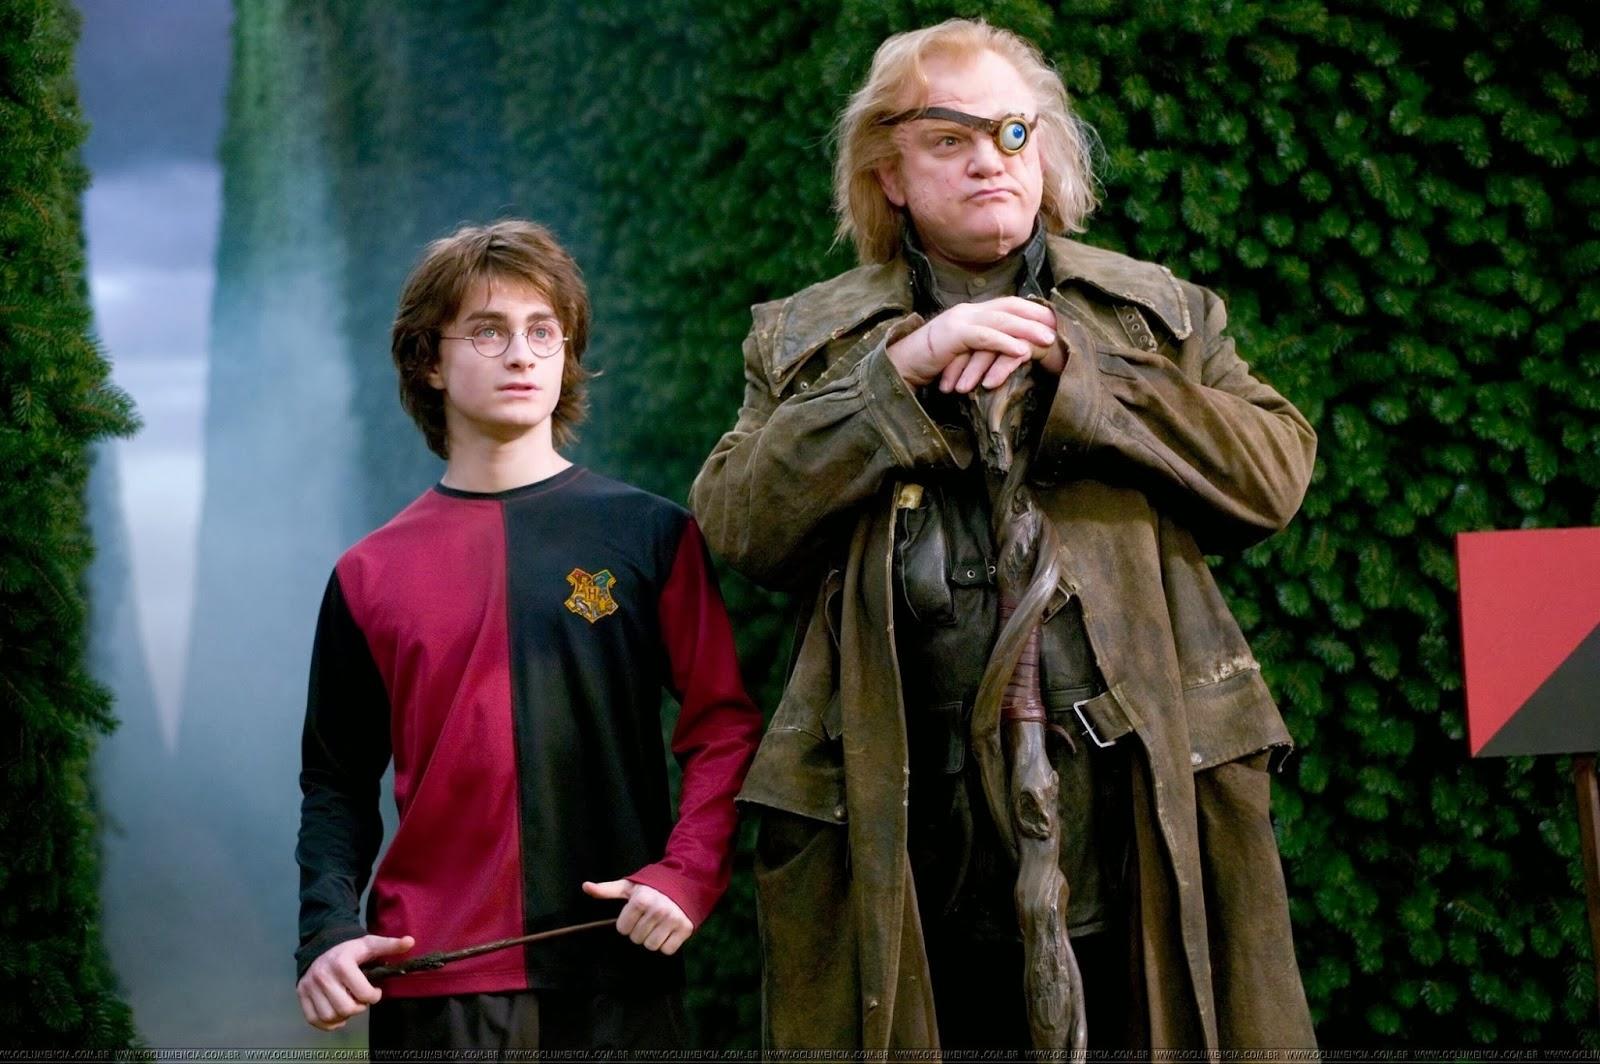 Harry Potter (Daniel Radcliffe) and new Dark Arts professor Alasdor Moody (Brendan Gleeson) in Harry Potter and the Goblet of Fire (2005)